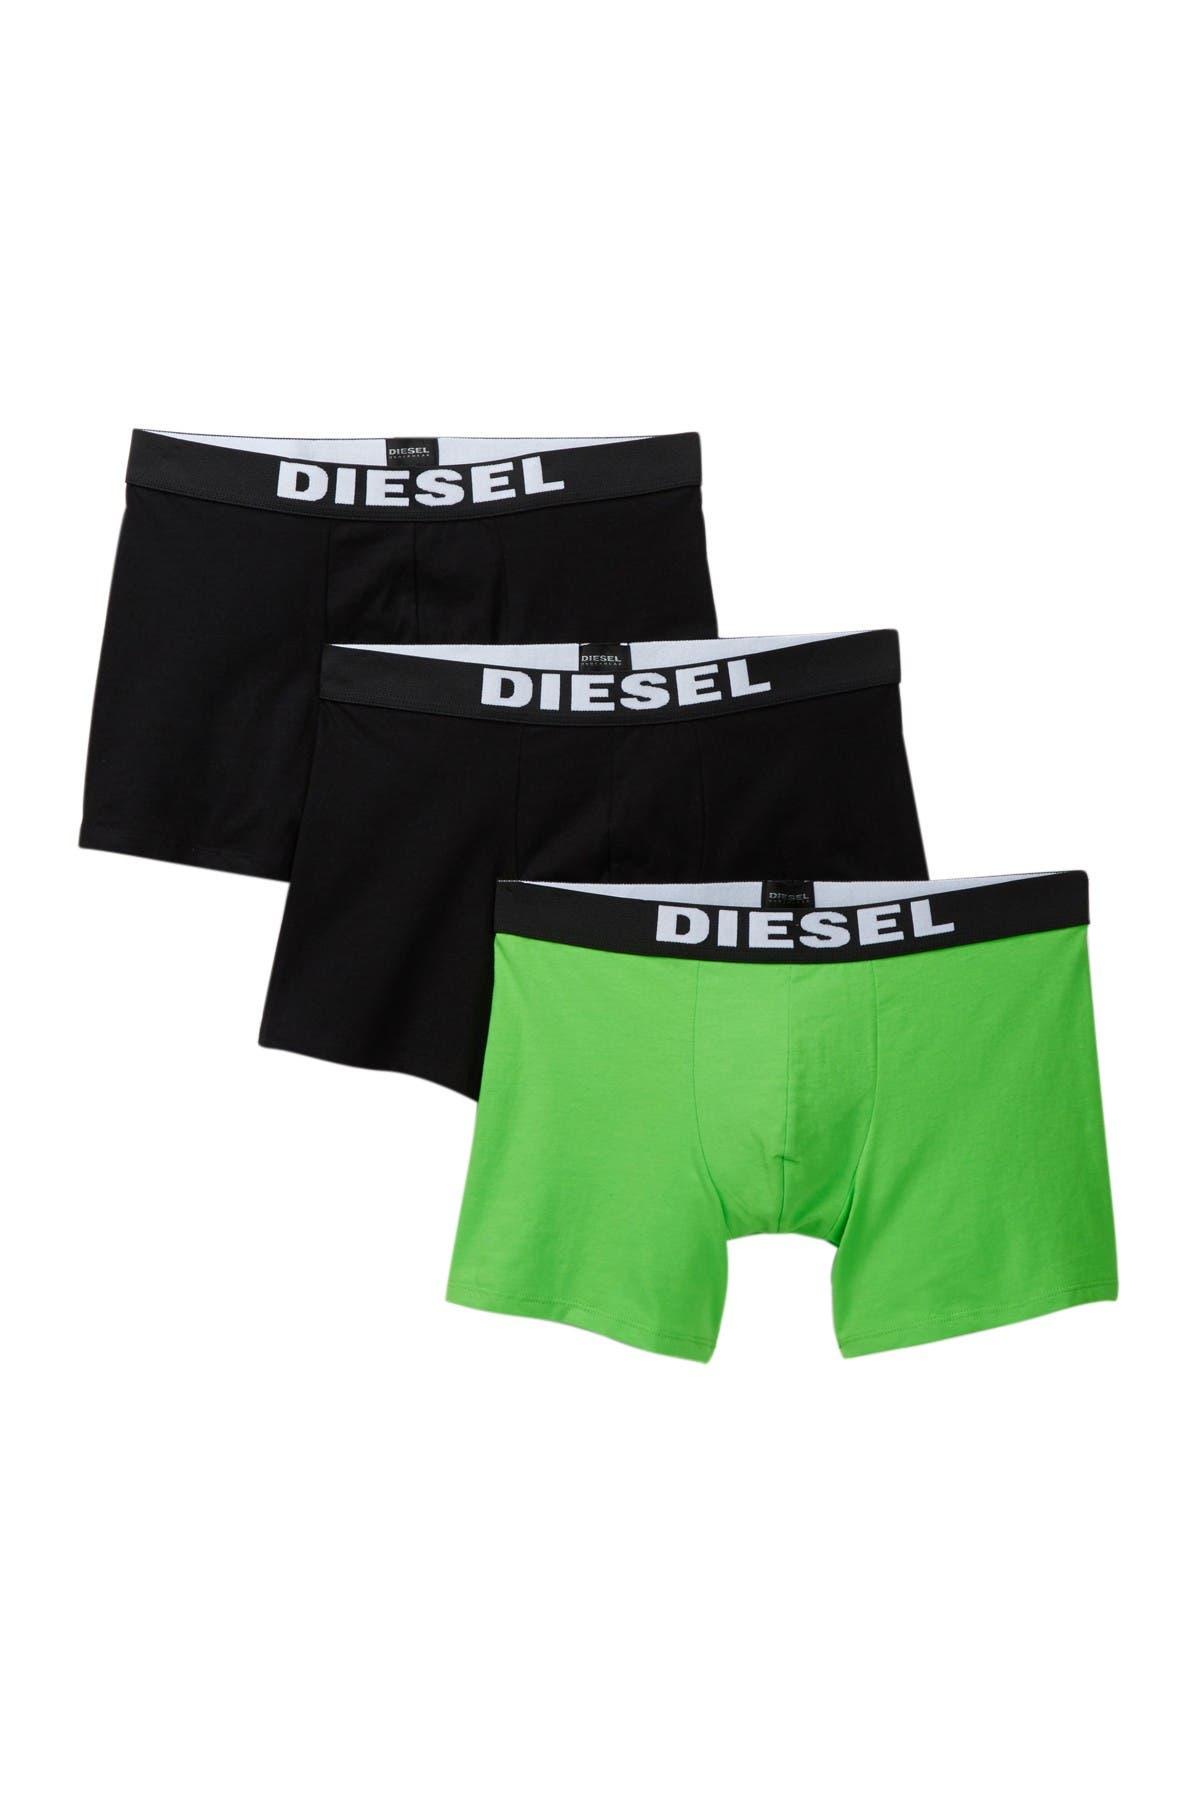 Image of Diesel Sebastian Cotton Blend Boxer Briefs - Pack of 3